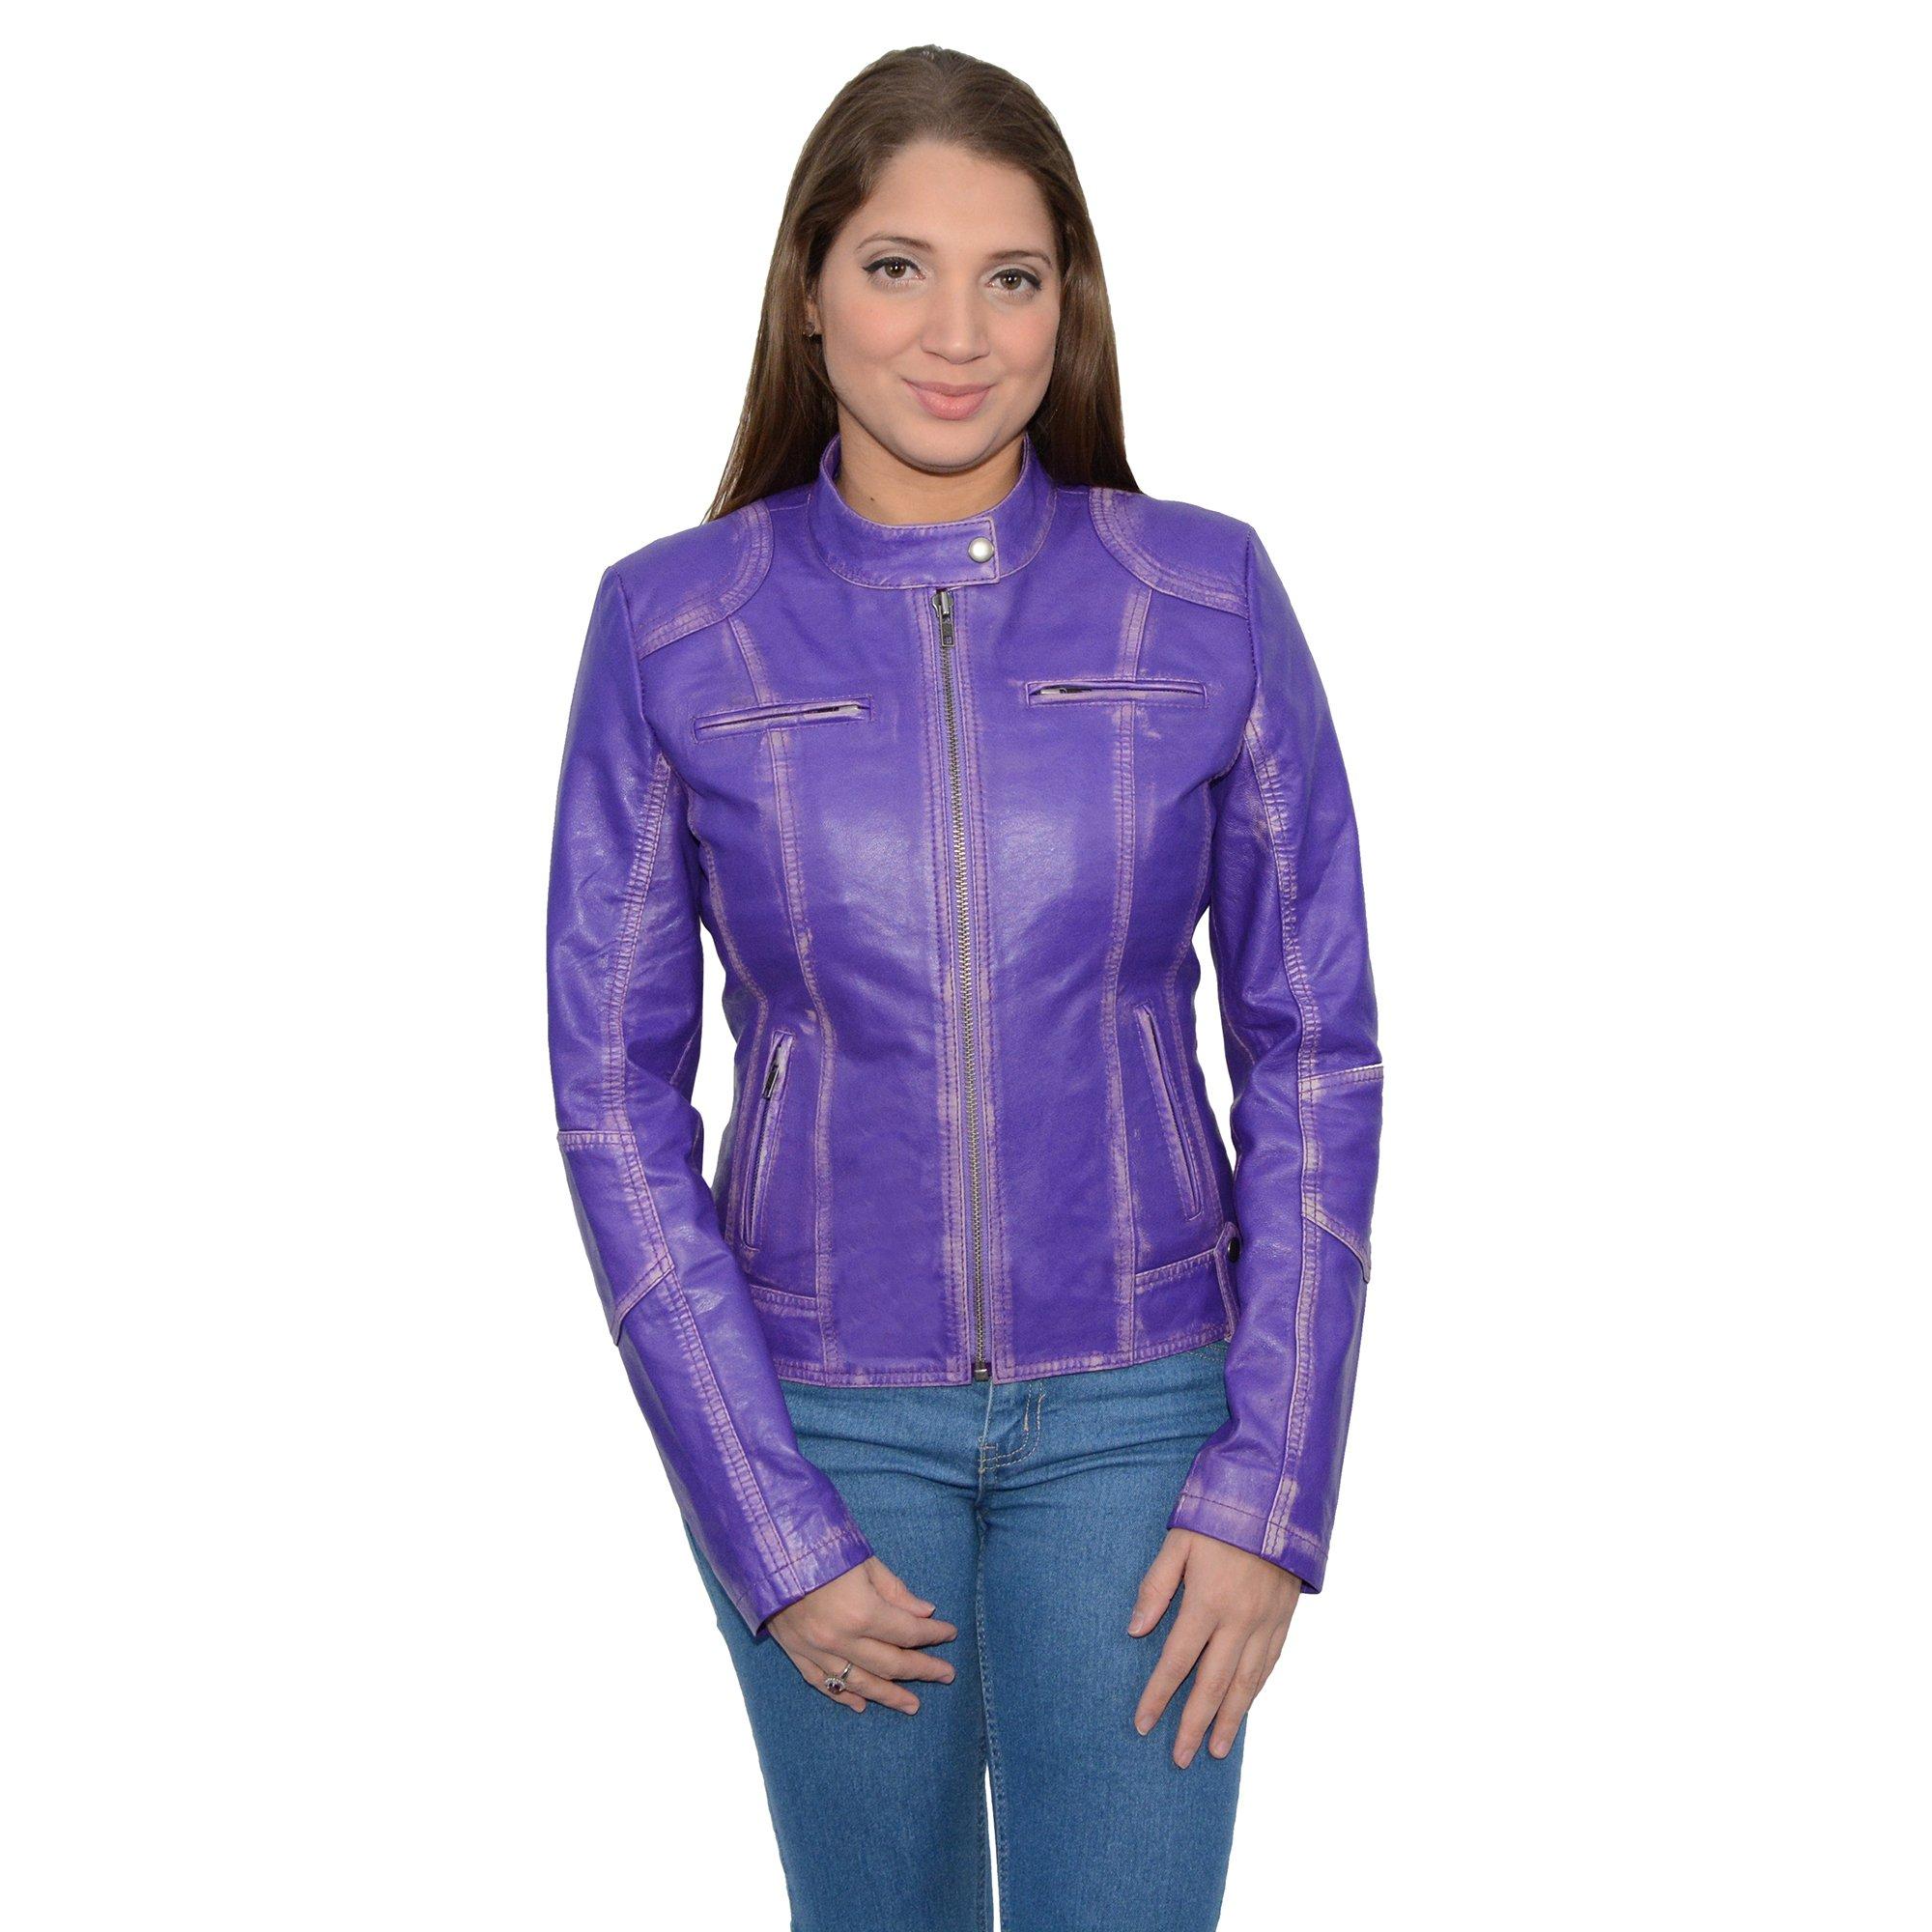 Milwaukee Leather Women's Sheepskin Scuba Style Moto Jacket (Purple, 3X-Large), 1 Pack by Milwaukee Leather